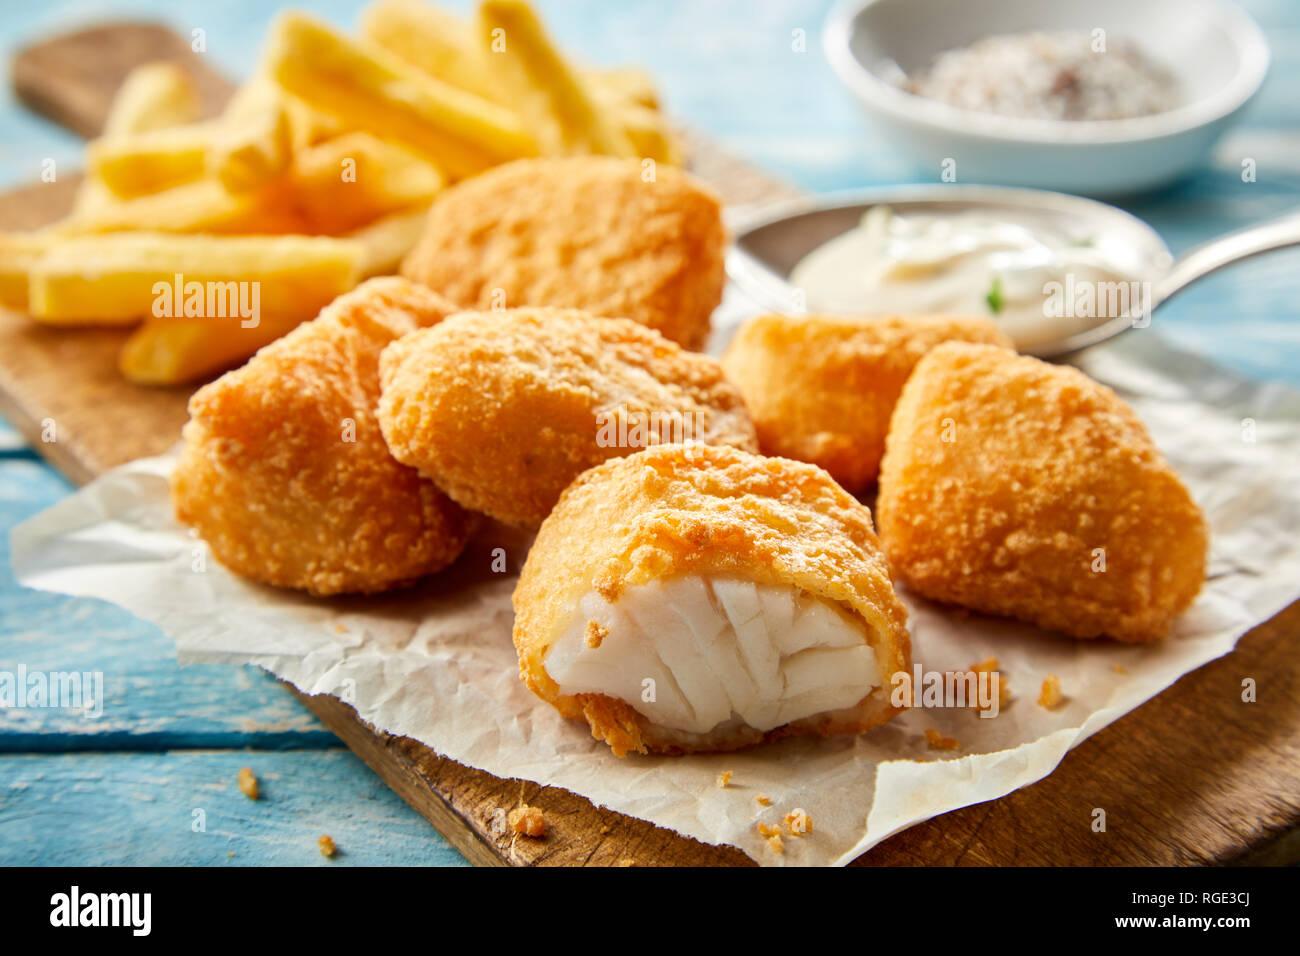 Cucina Olandese Immagini Cucina Olandese Fotos Stock Alamy